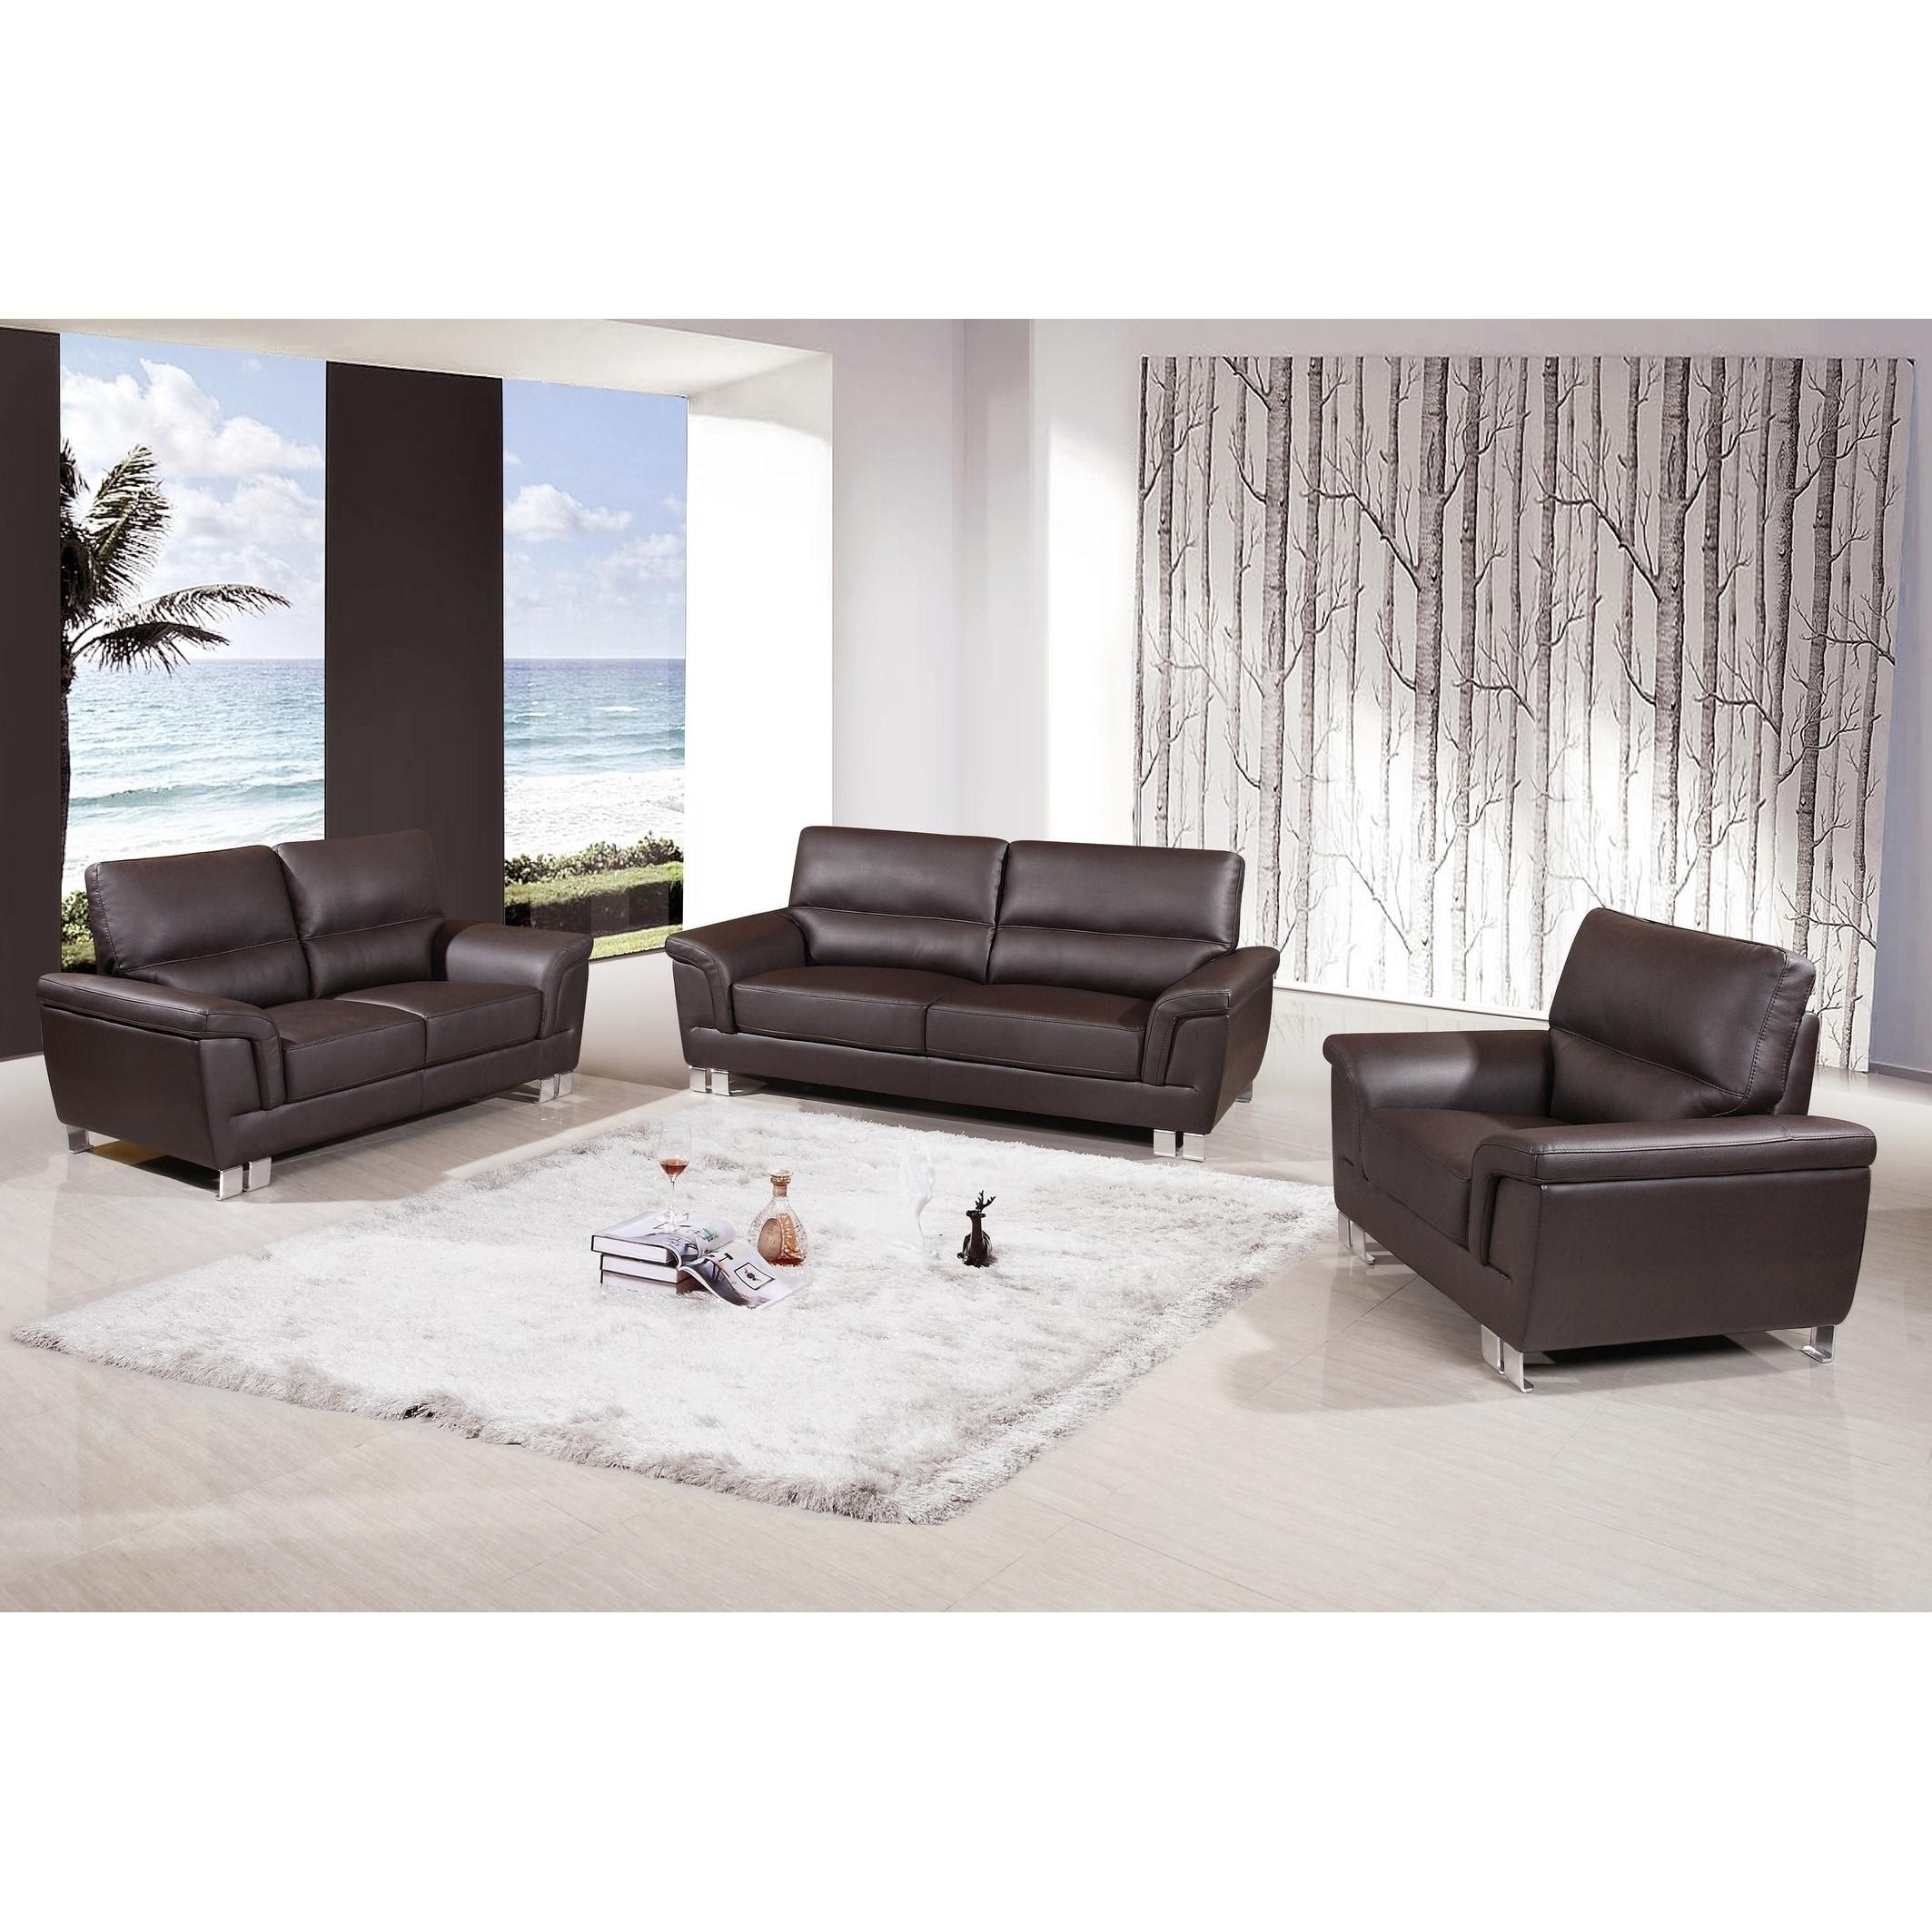 Watson Leather Gel/Match Upholstered 3-Piece Living Room Sofa Set ...